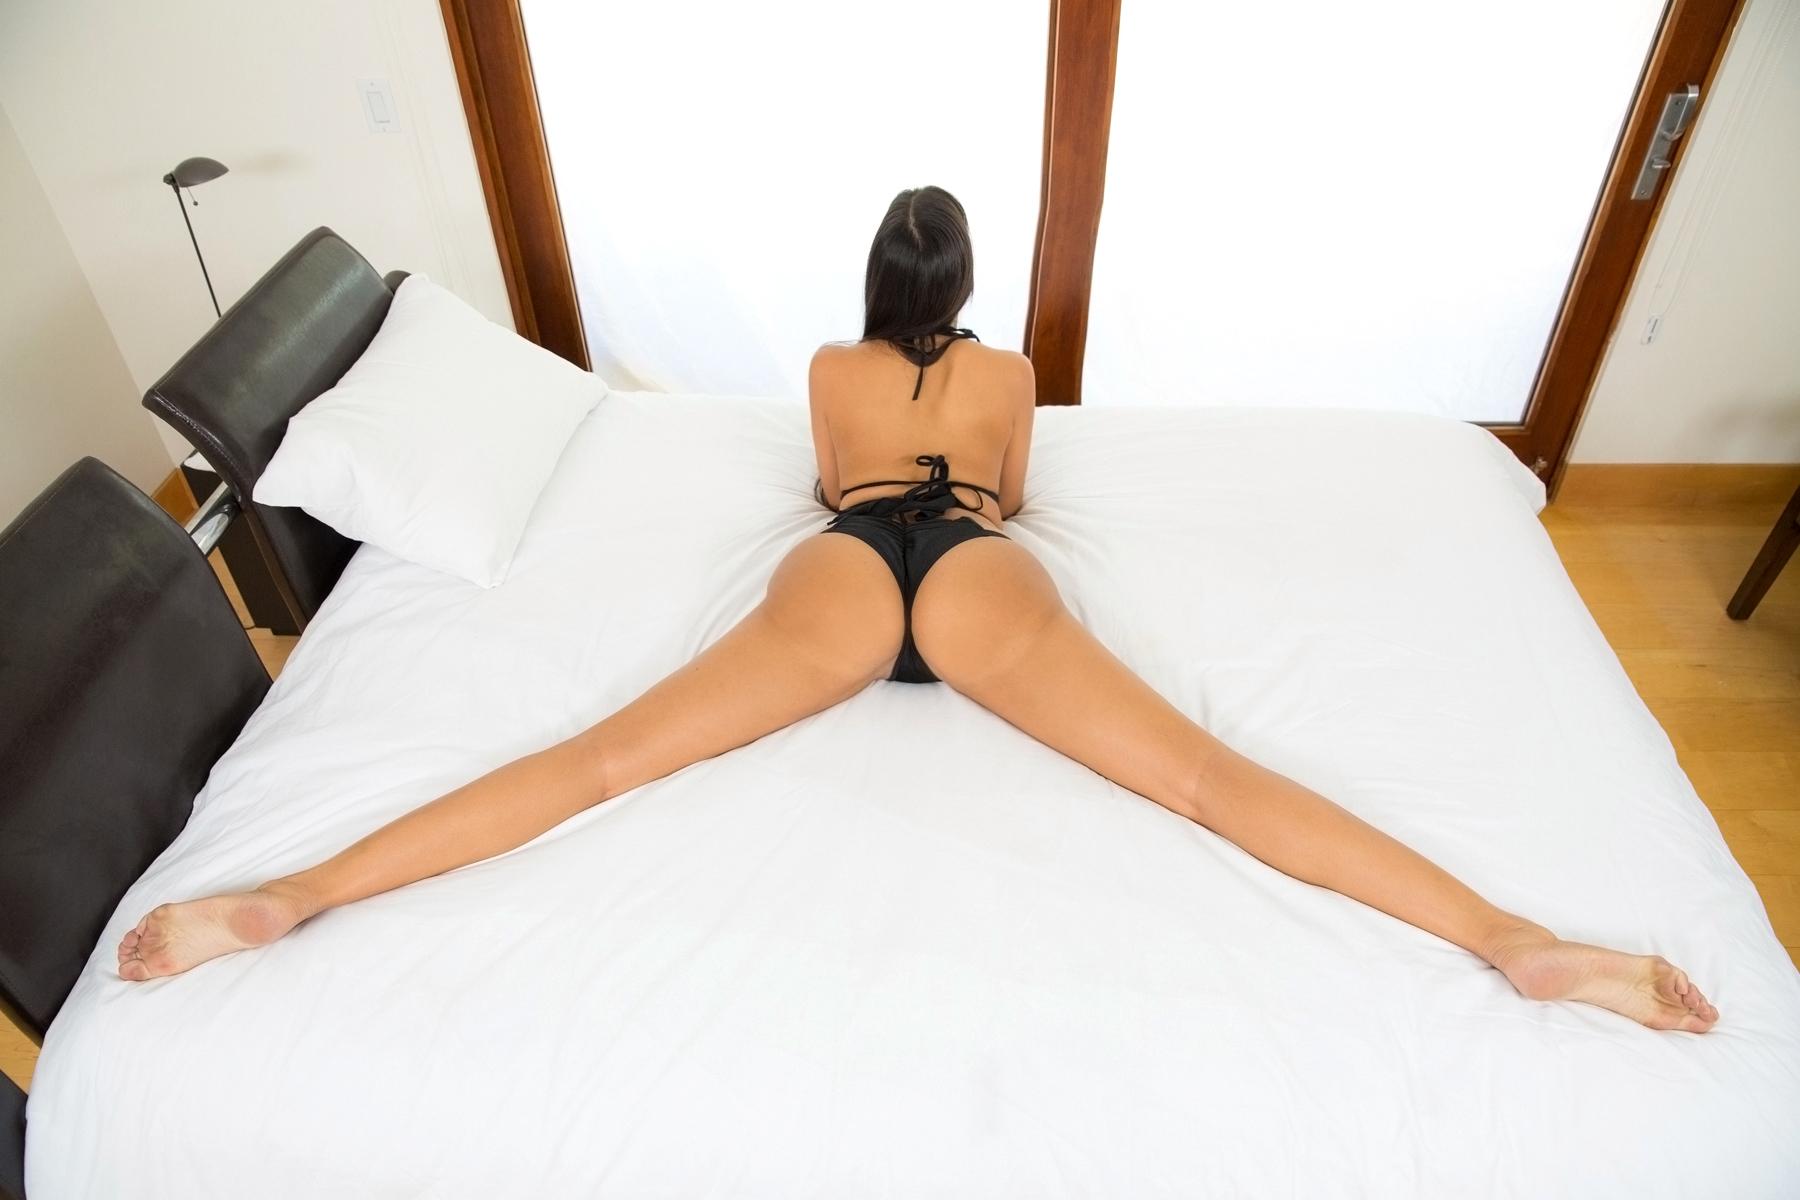 Mass nude lesbo pics erotic videos